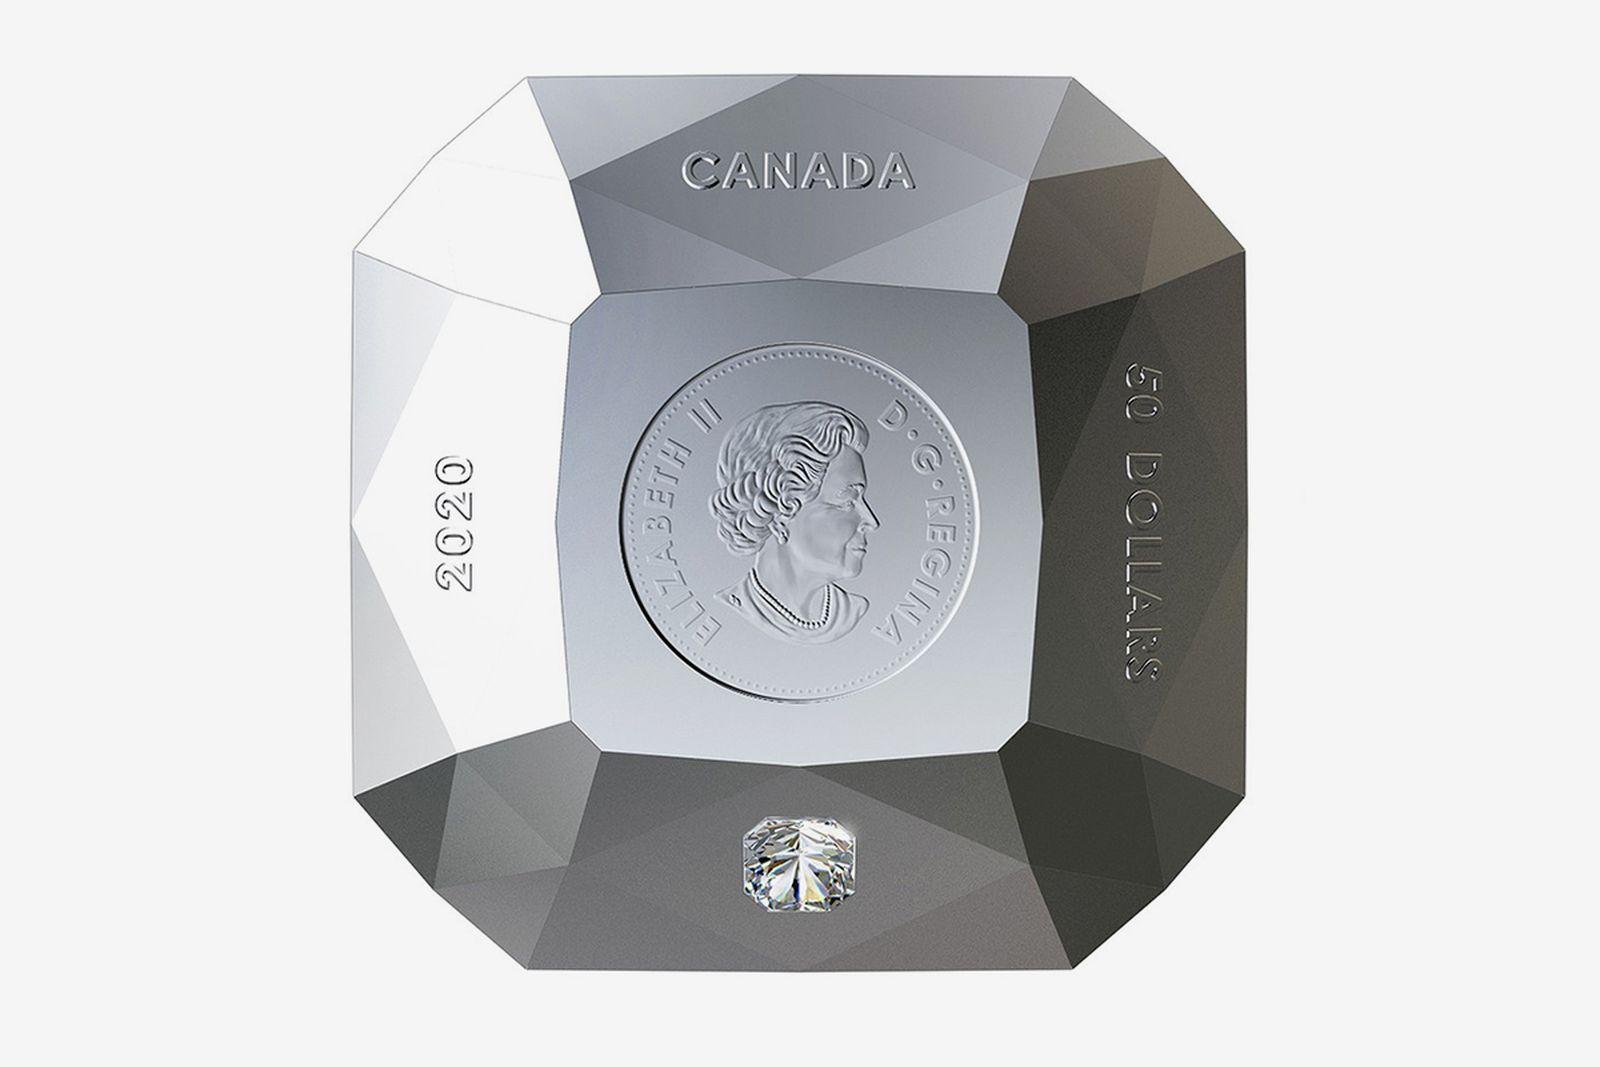 royal-canadian-mint-diamond-shaped-coin-02